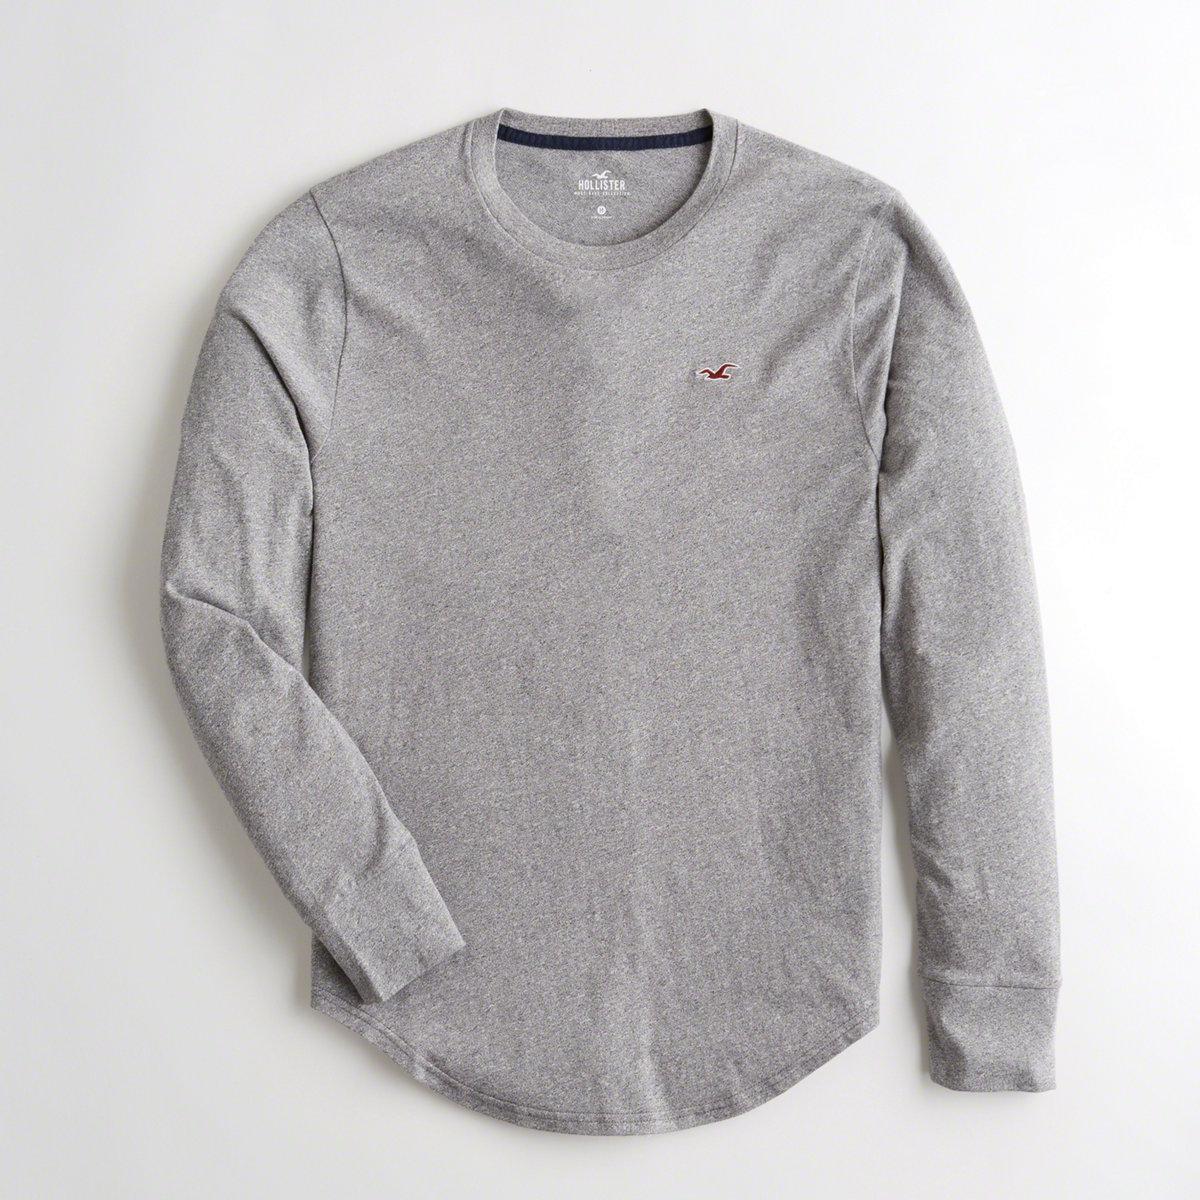 8059067c55b8 ... Guys Curved Hem Crewneck T-shirt From Hollister for Men - Lyst. View  fullscreen